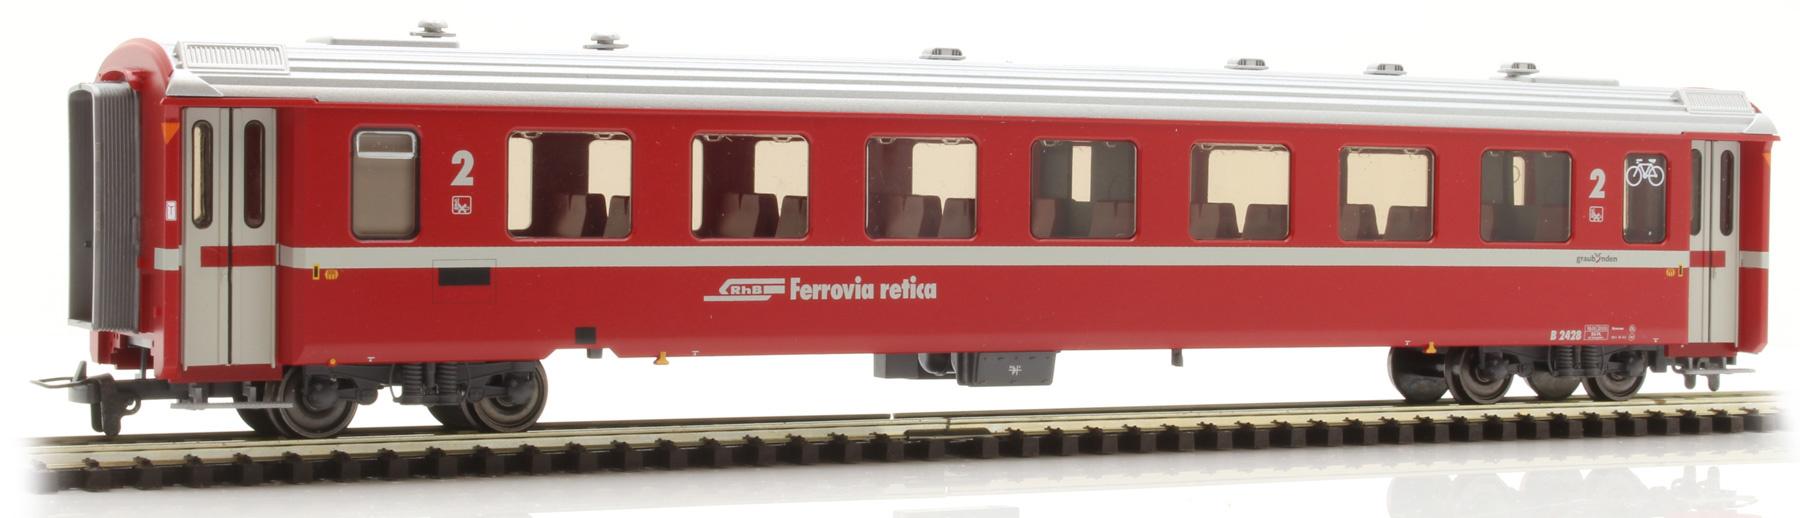 3240168 RhB B 2428 Einheitswagen II neurot-1